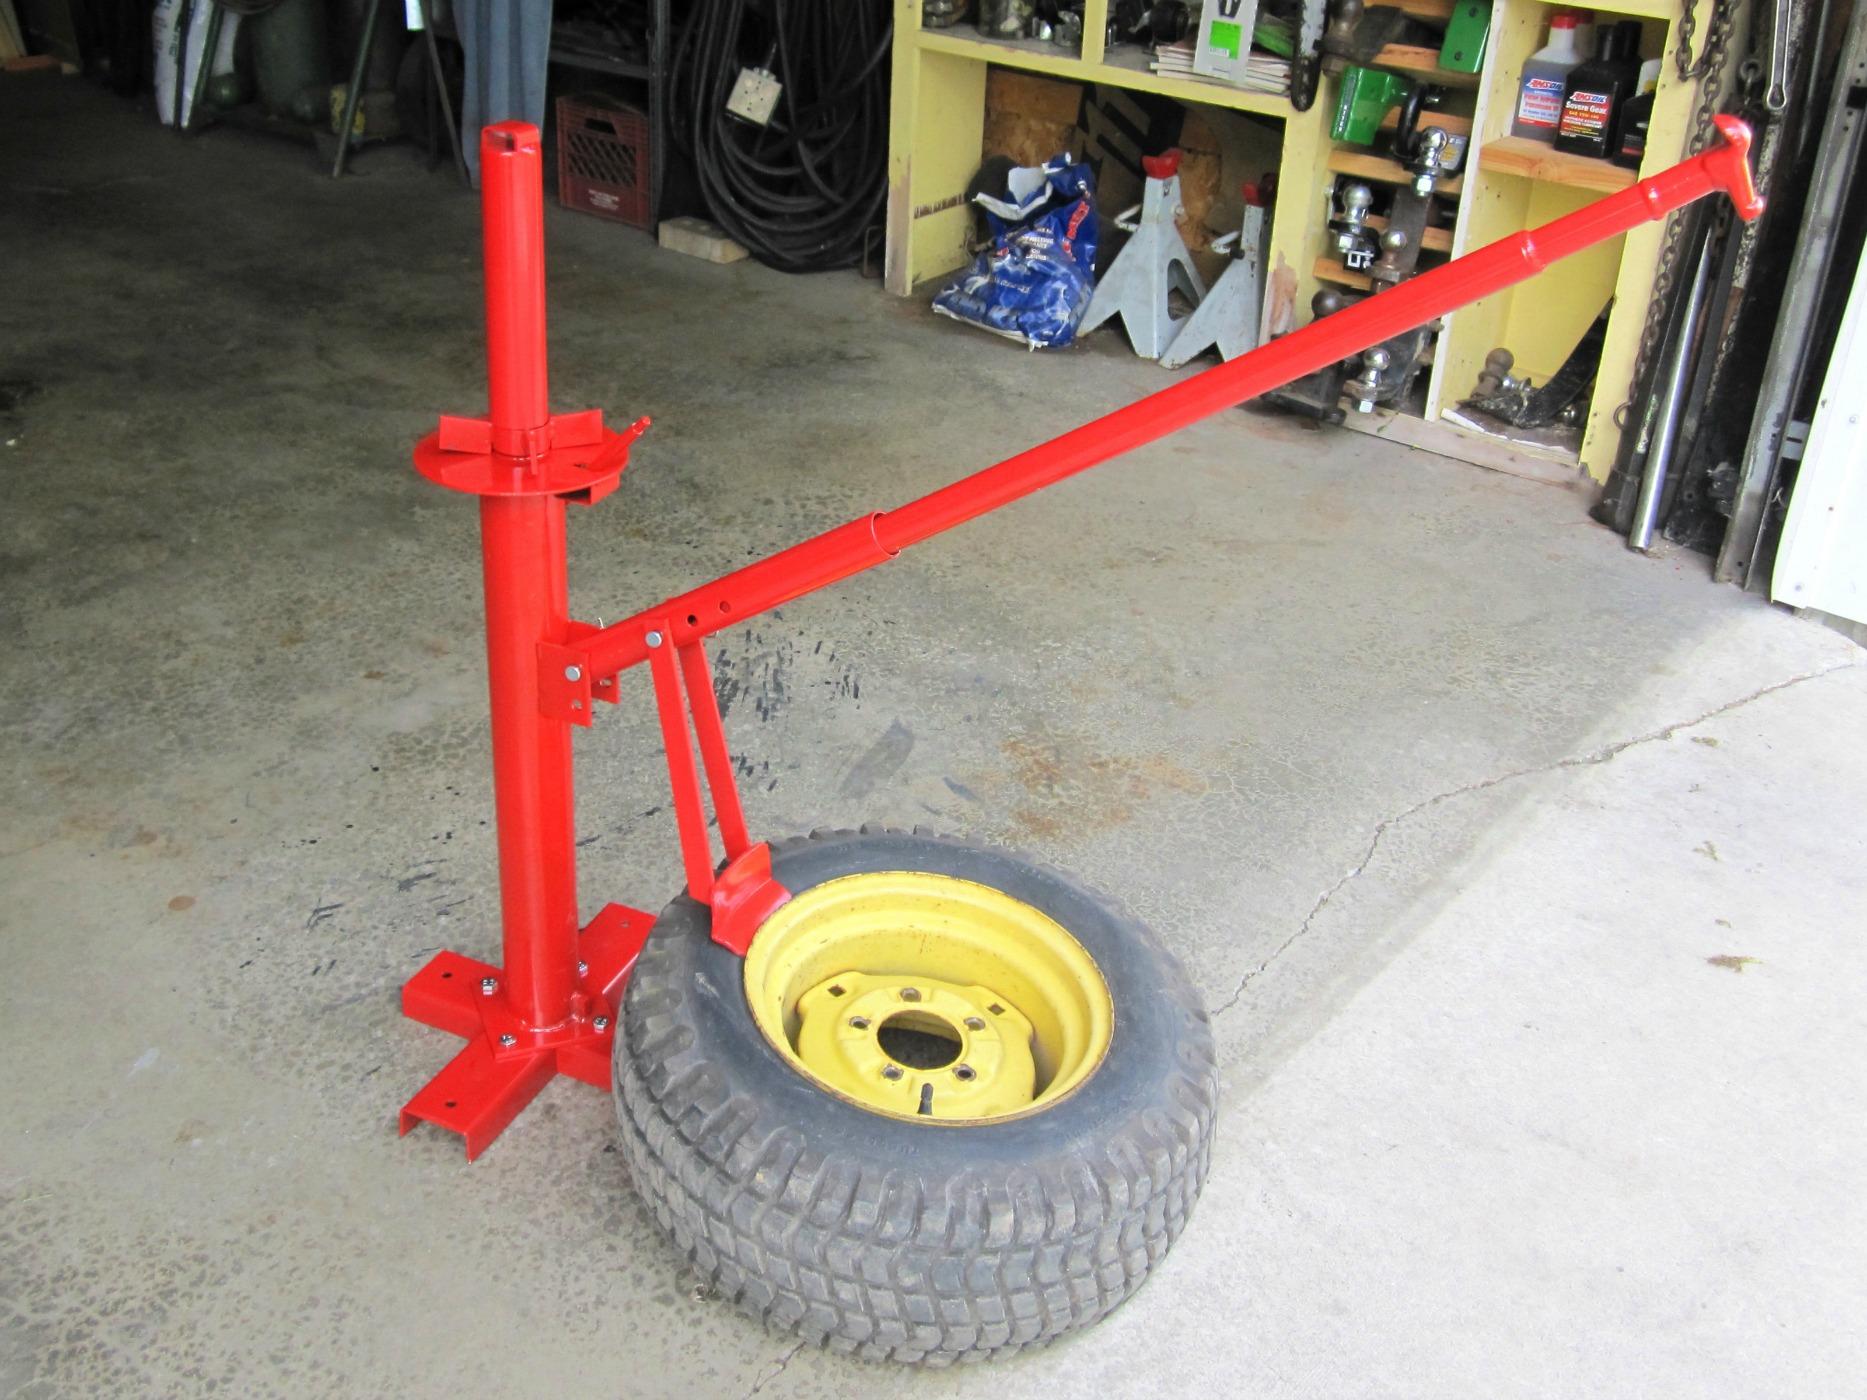 harbor freight tire changer - MyTractorForum.com - The Friendliest ...